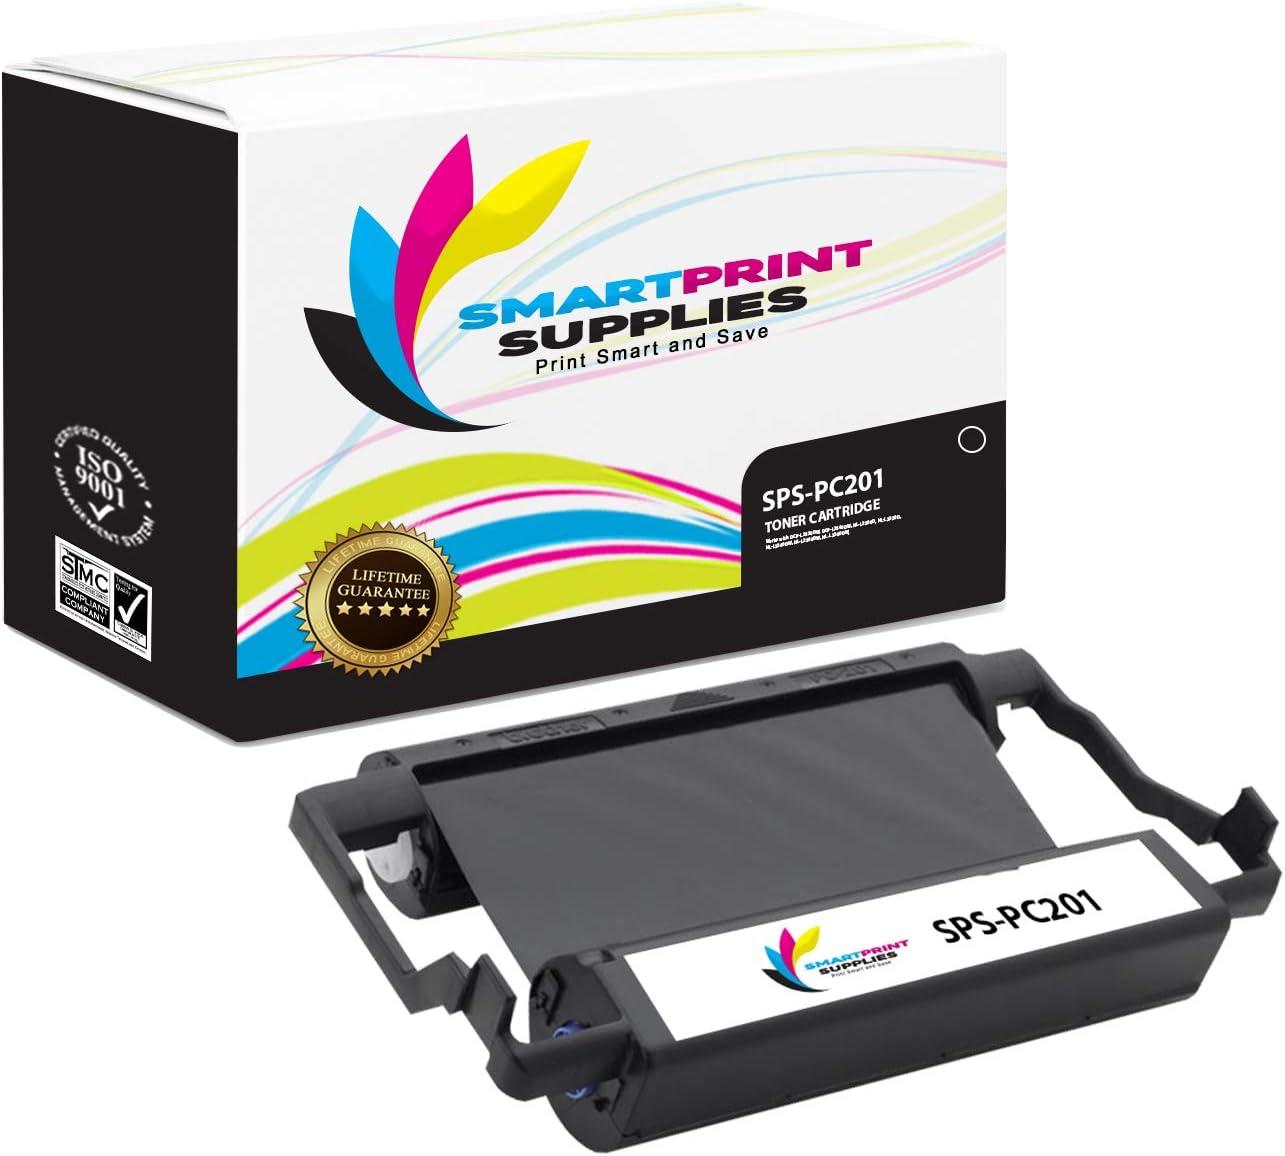 Smart Print Supplies Compatible Brother PC201 Black Ribbon Cartridge for Intellifax 1170 1270 1270E 1570MC 1575MC, MFC 1770 1780 1870MC 1970MC Printer 5M Characters